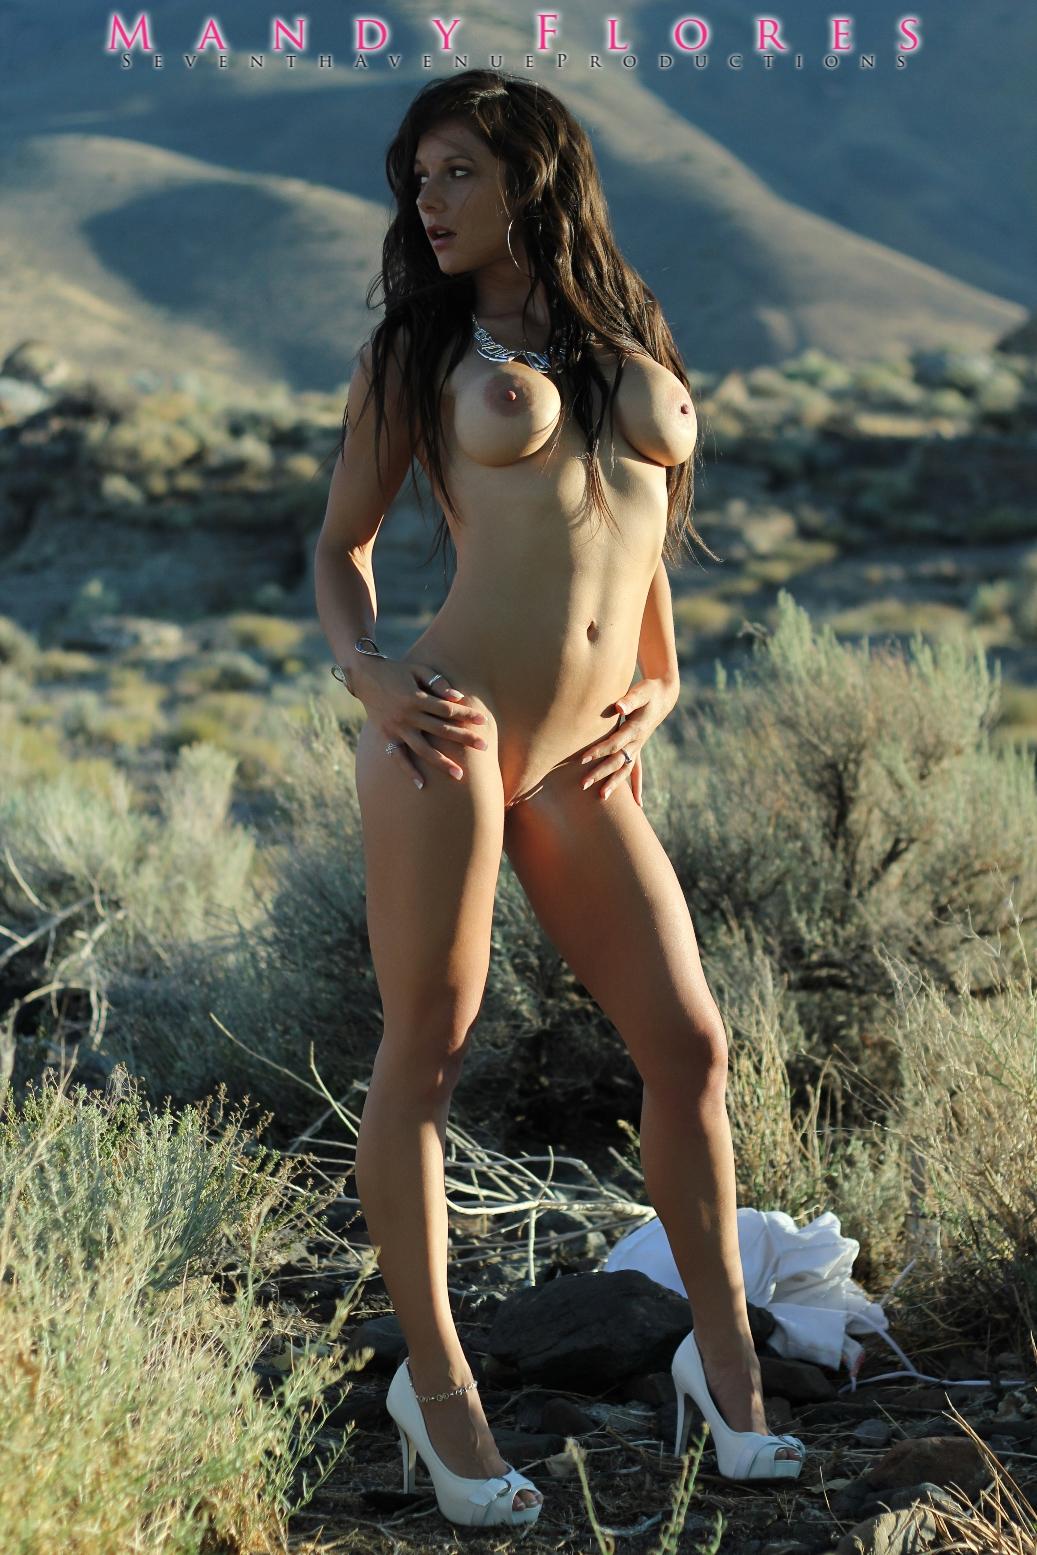 Mandy flores nude